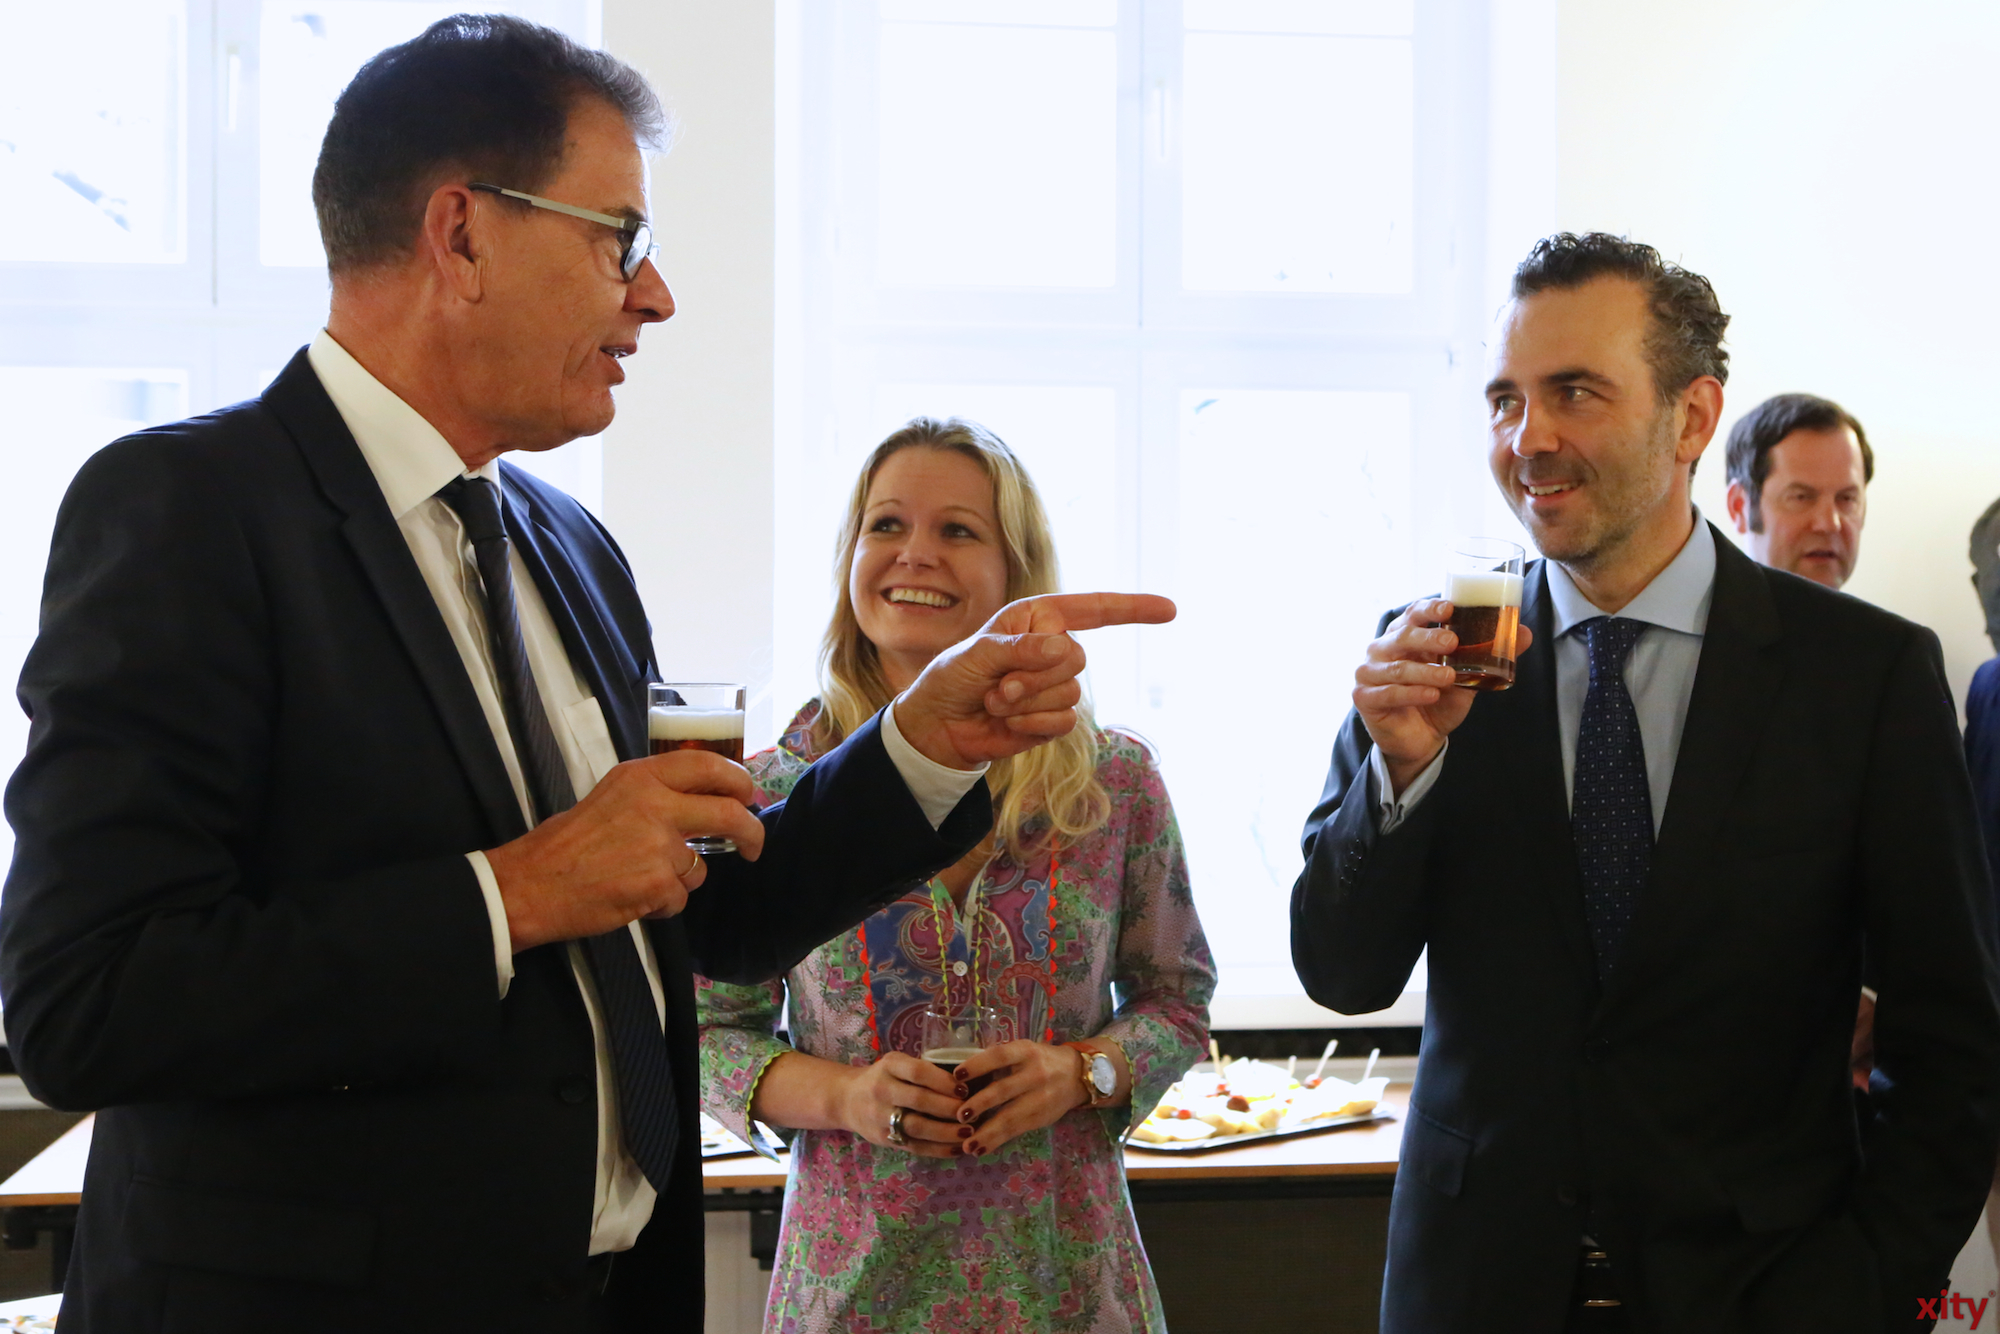 (v.l.) Dr. Gerd Müller, Angela Erwin und Thomas Jarzombek (Foto: xity)